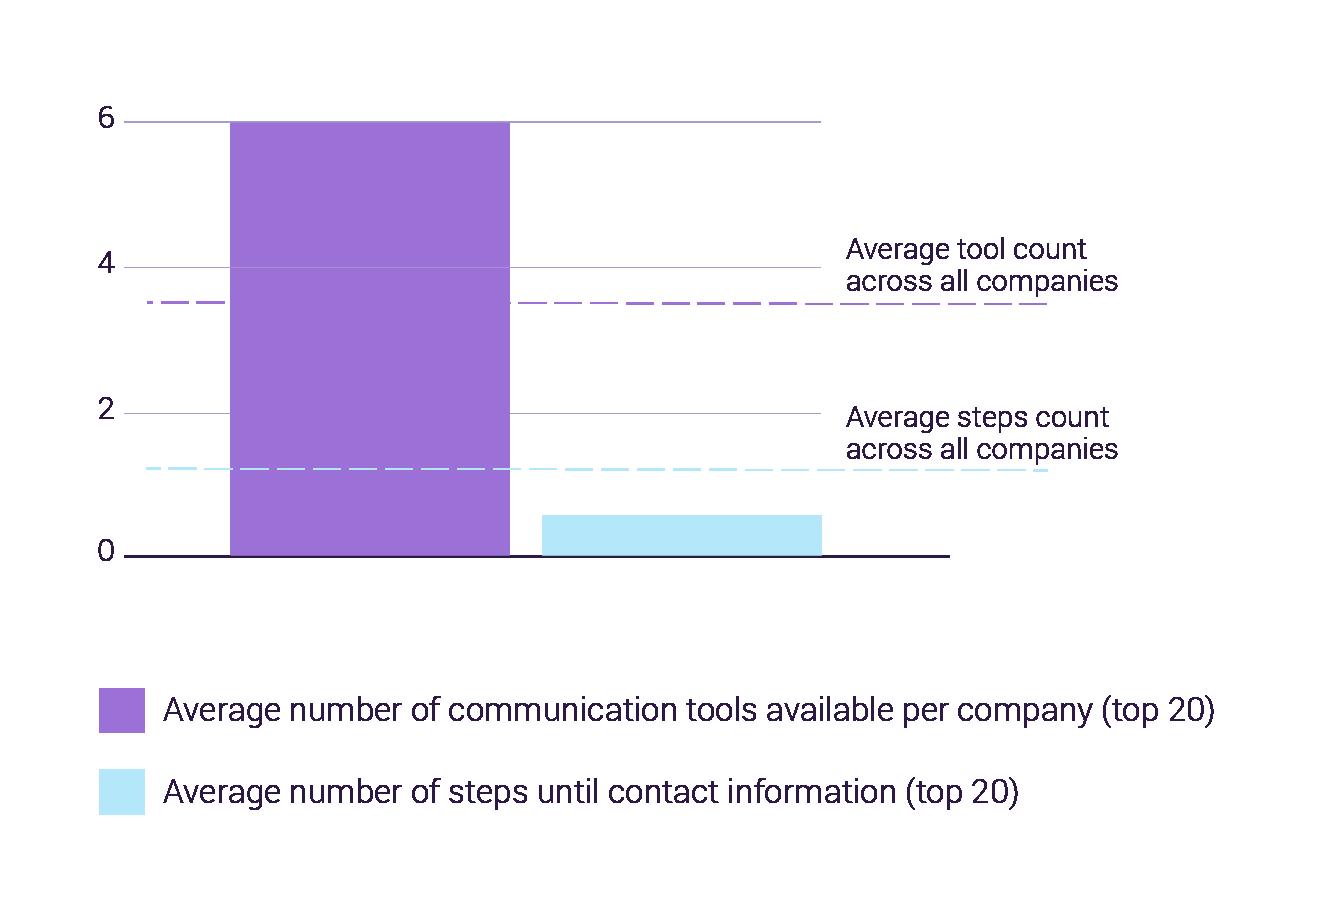 Average number of customer service tools, getejnny 2020